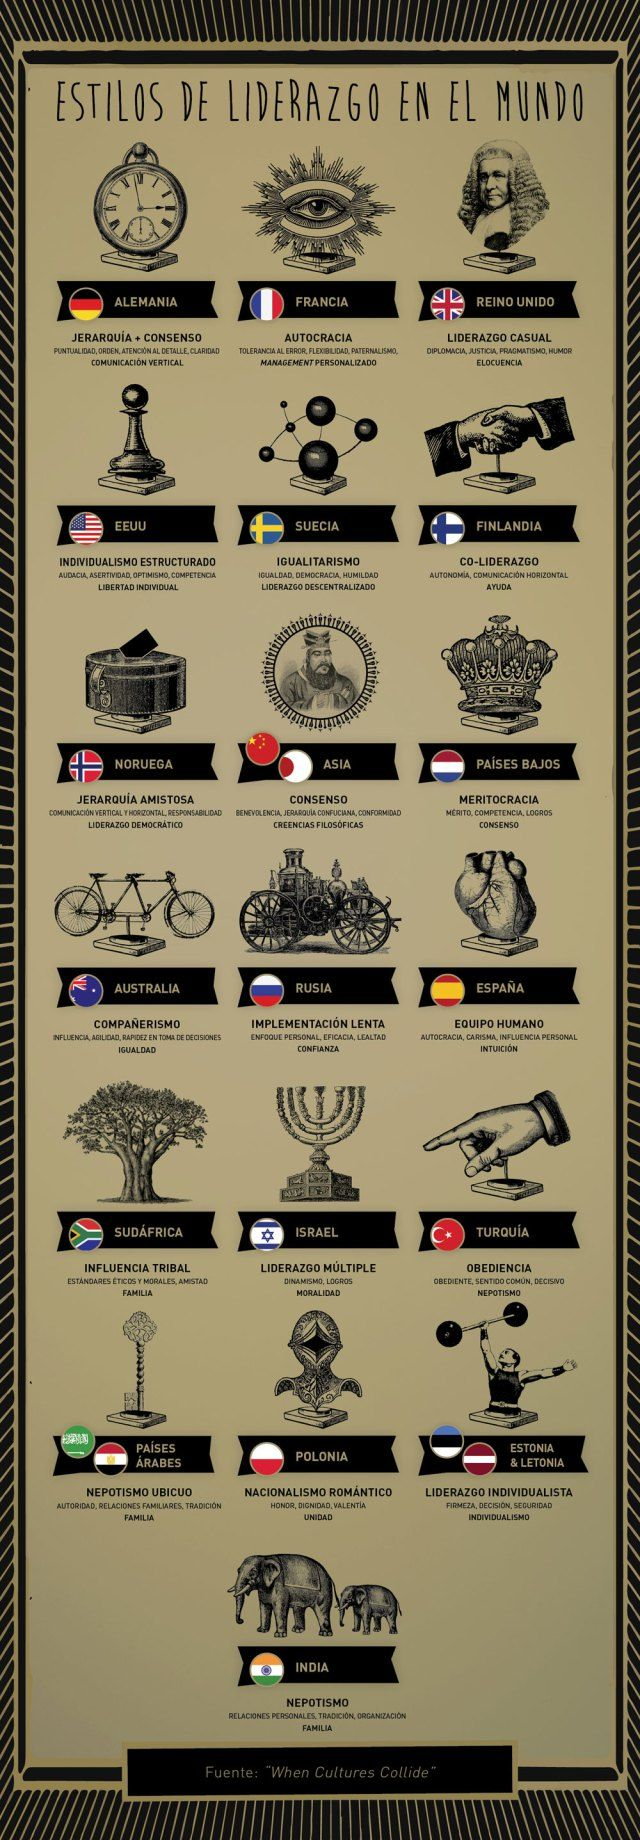 20 estilos de liderazgo en el Mundo #infografia #infographic